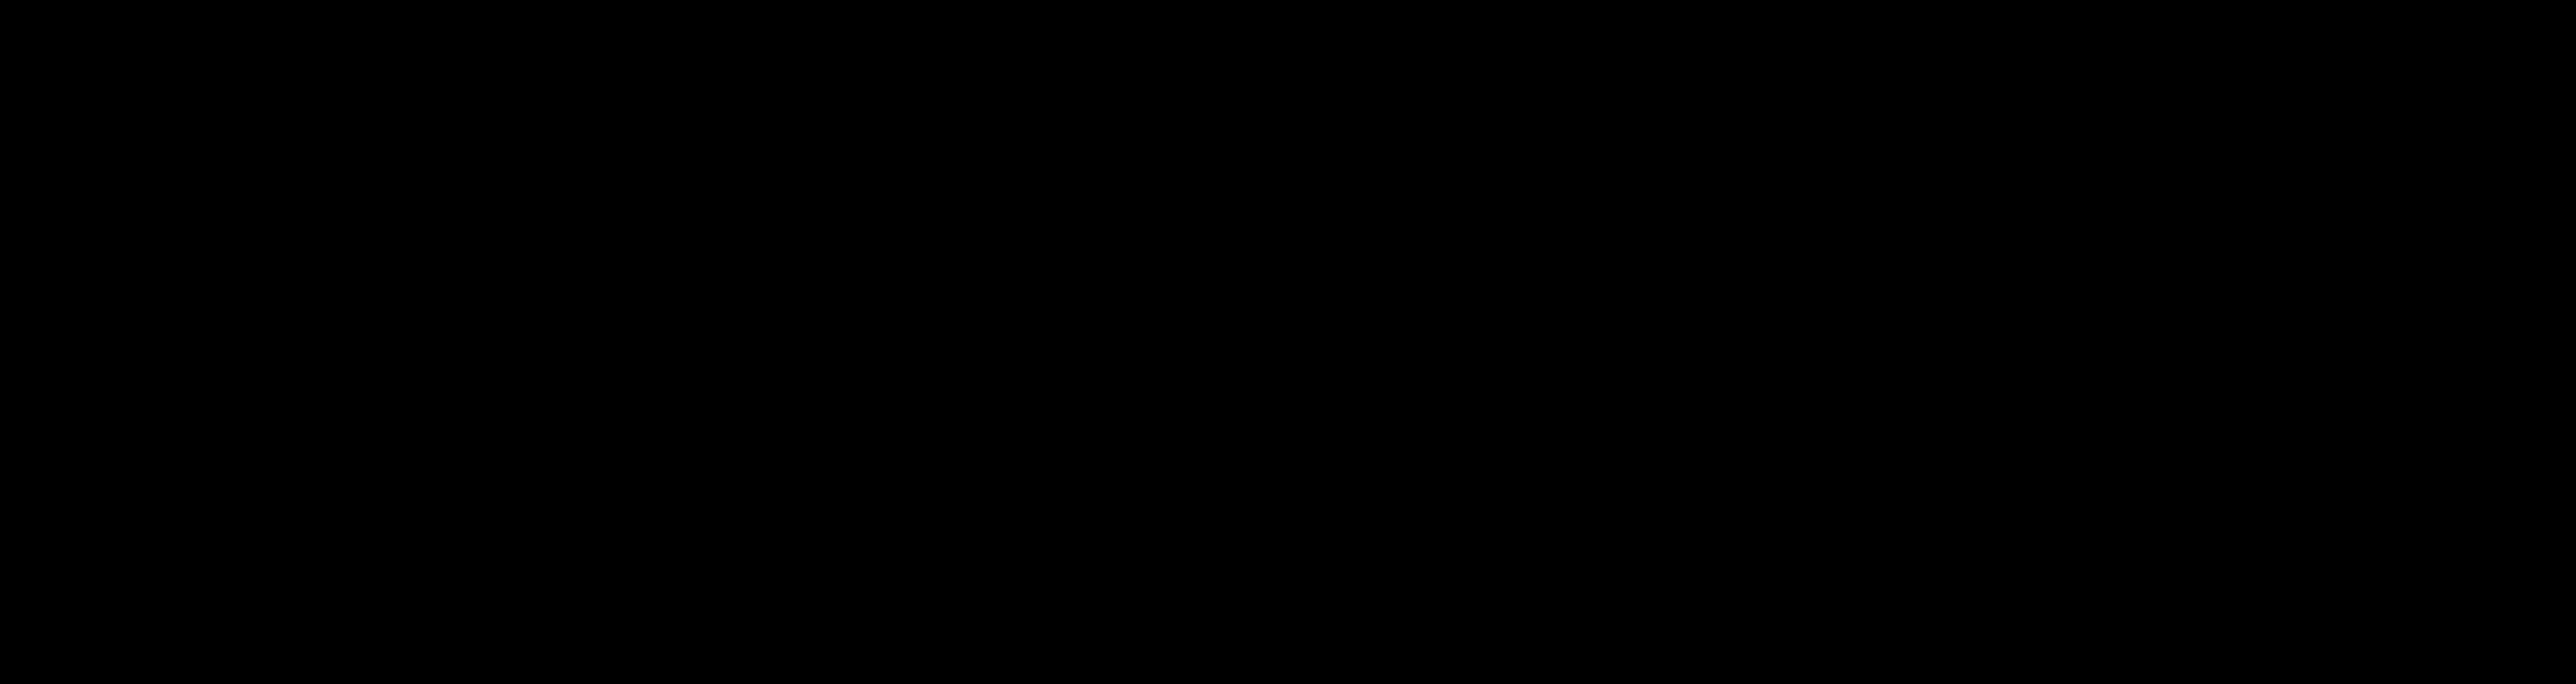 N2-t-Boc-N6-(biotinamido-6-N-caproylamido)lysine N-hydroxysuccinimide ester